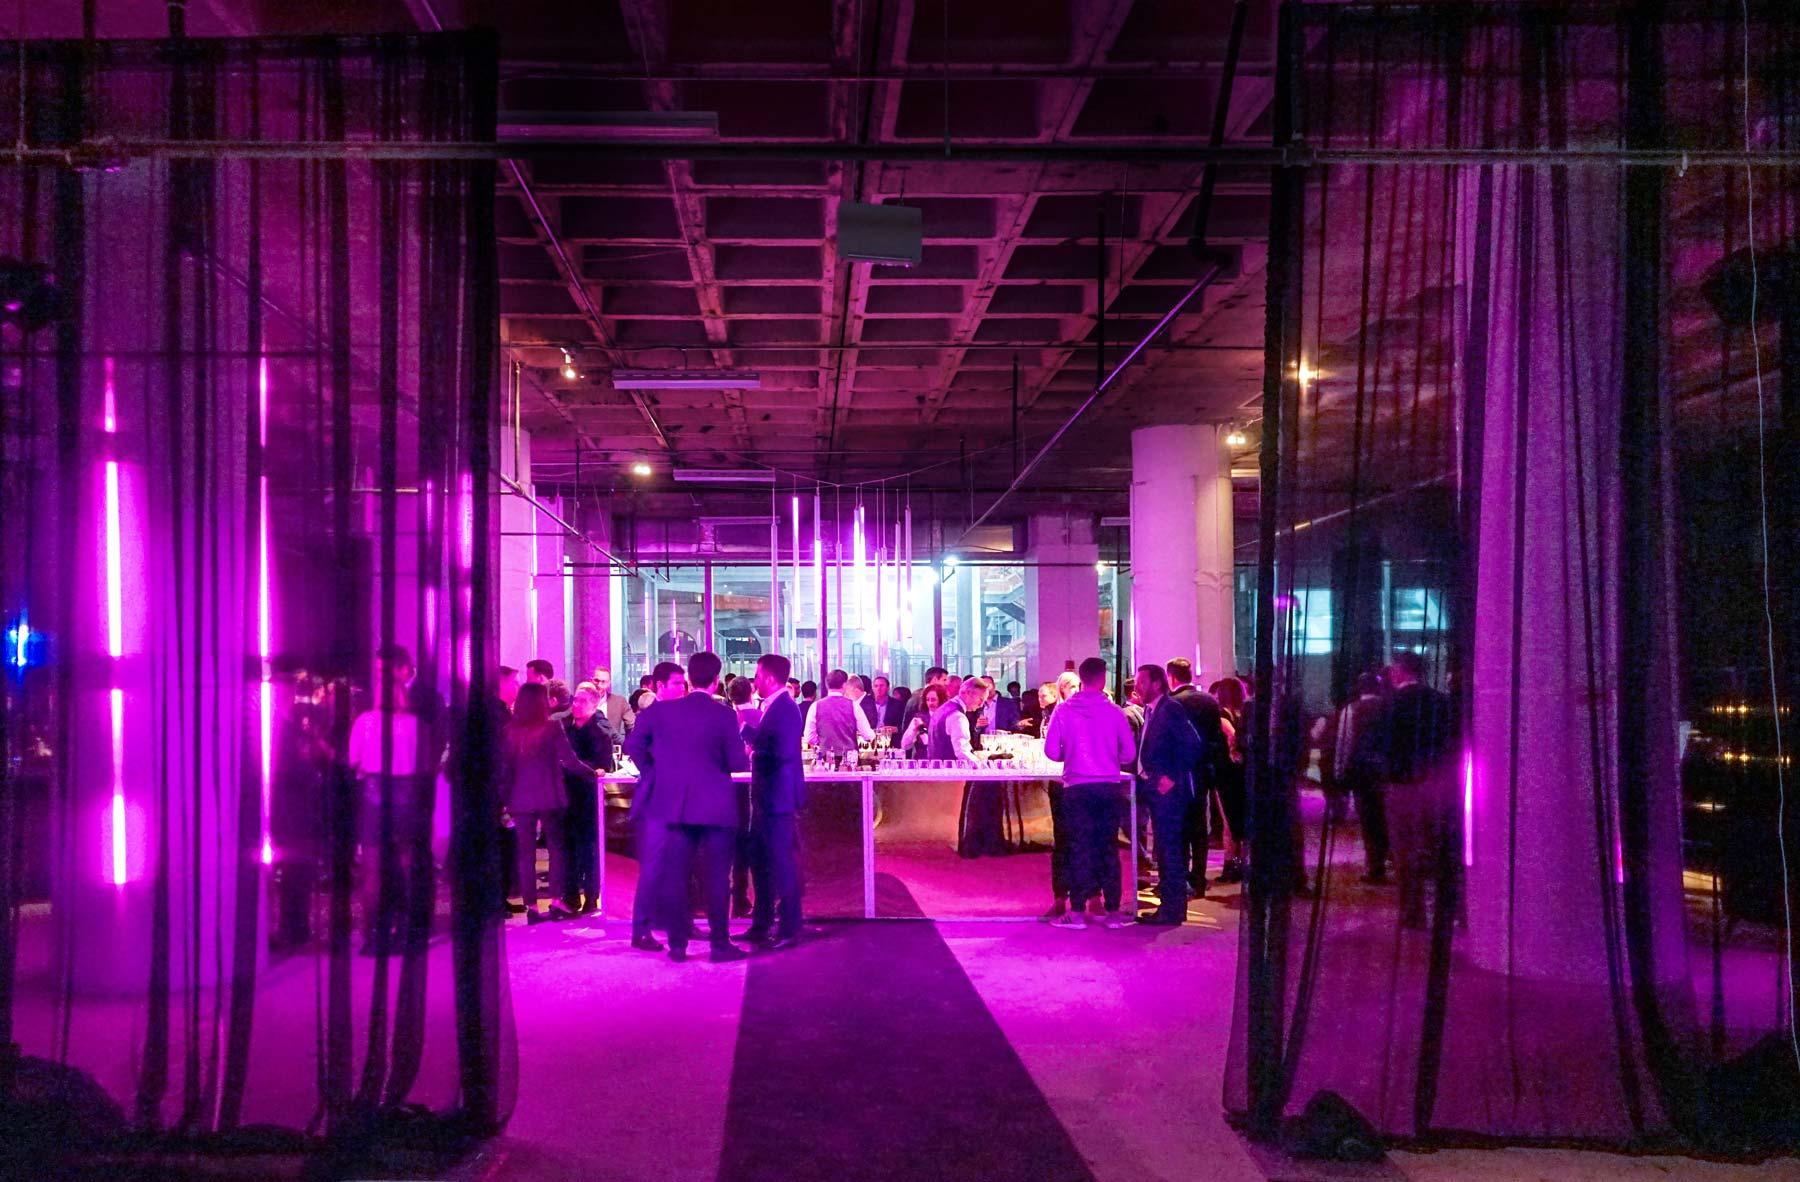 Raiola-Event-Design-Retail-Broker-Event-7.jpg